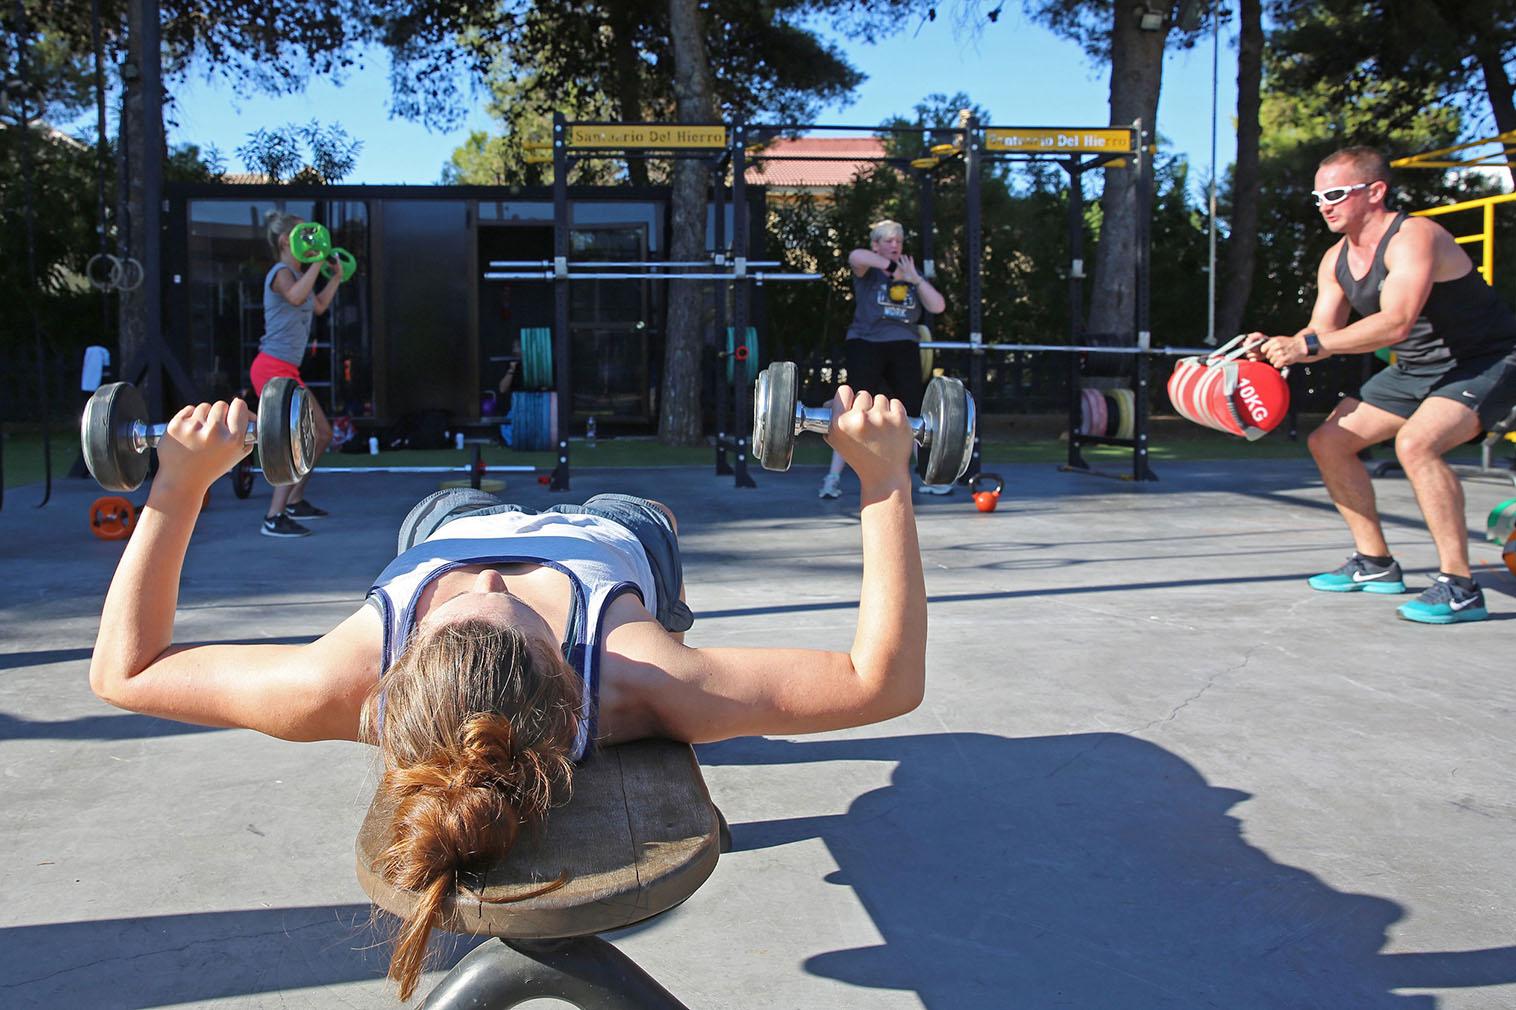 Boot Camp Marbella - Fitness Holidays in Marbella, Costa del Sol